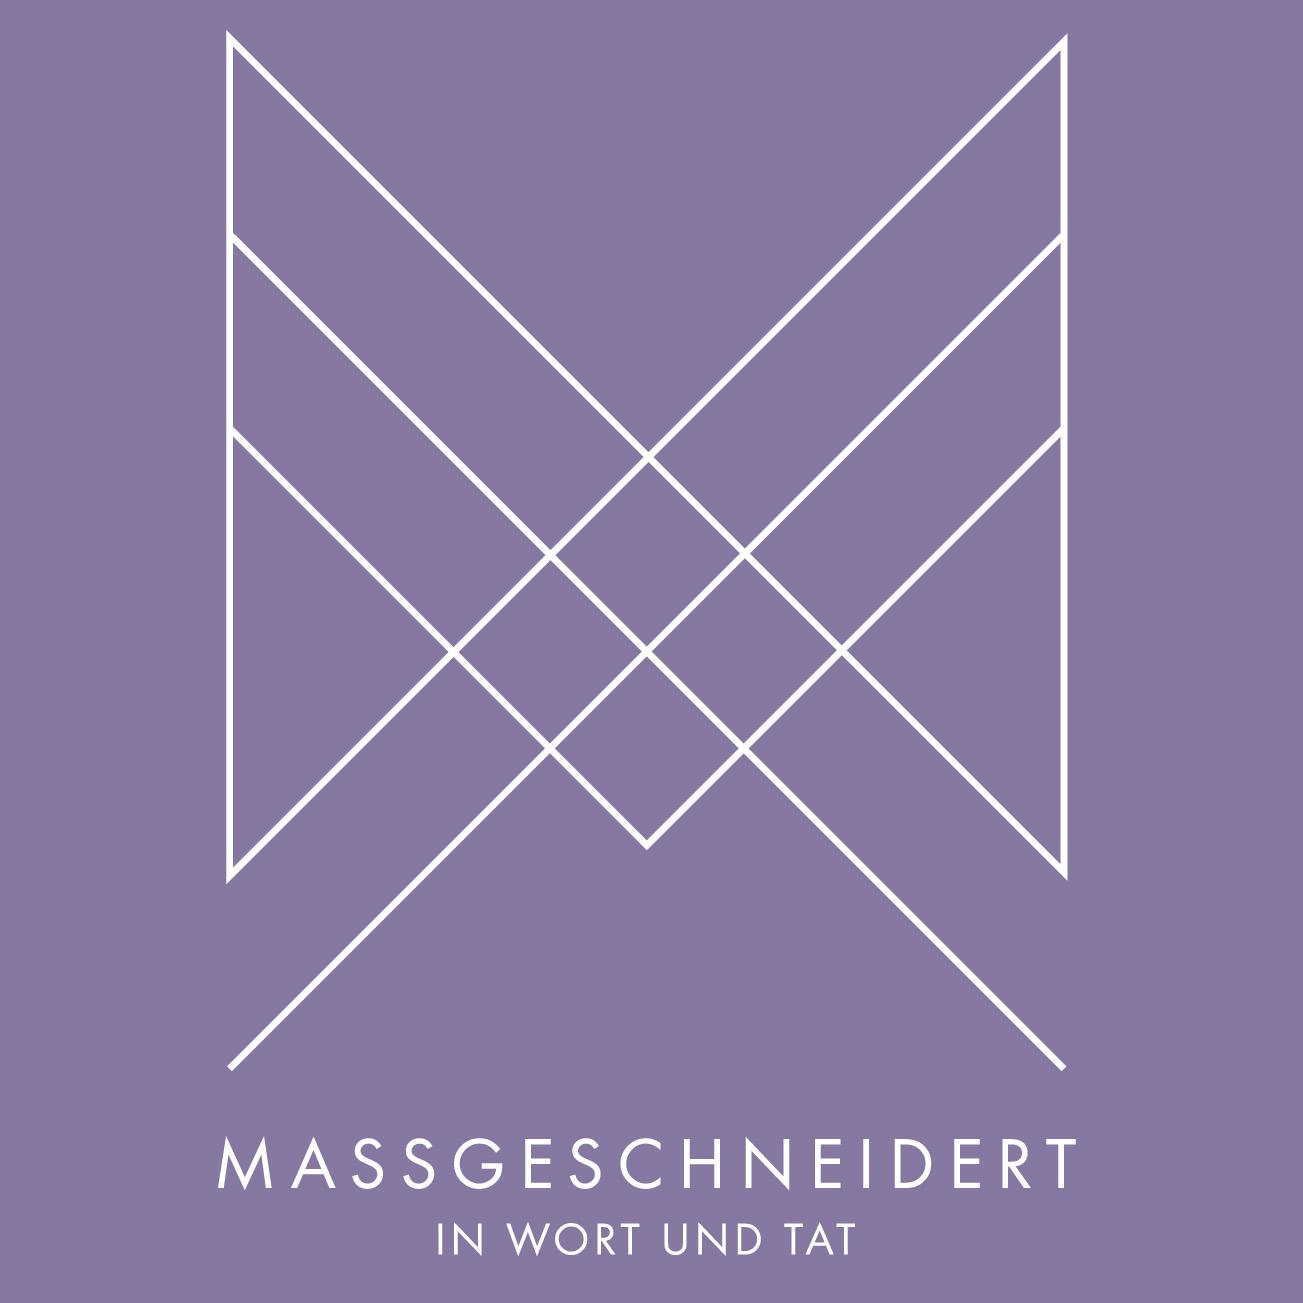 massgeschneidert Kommunikationsbüro GmbH